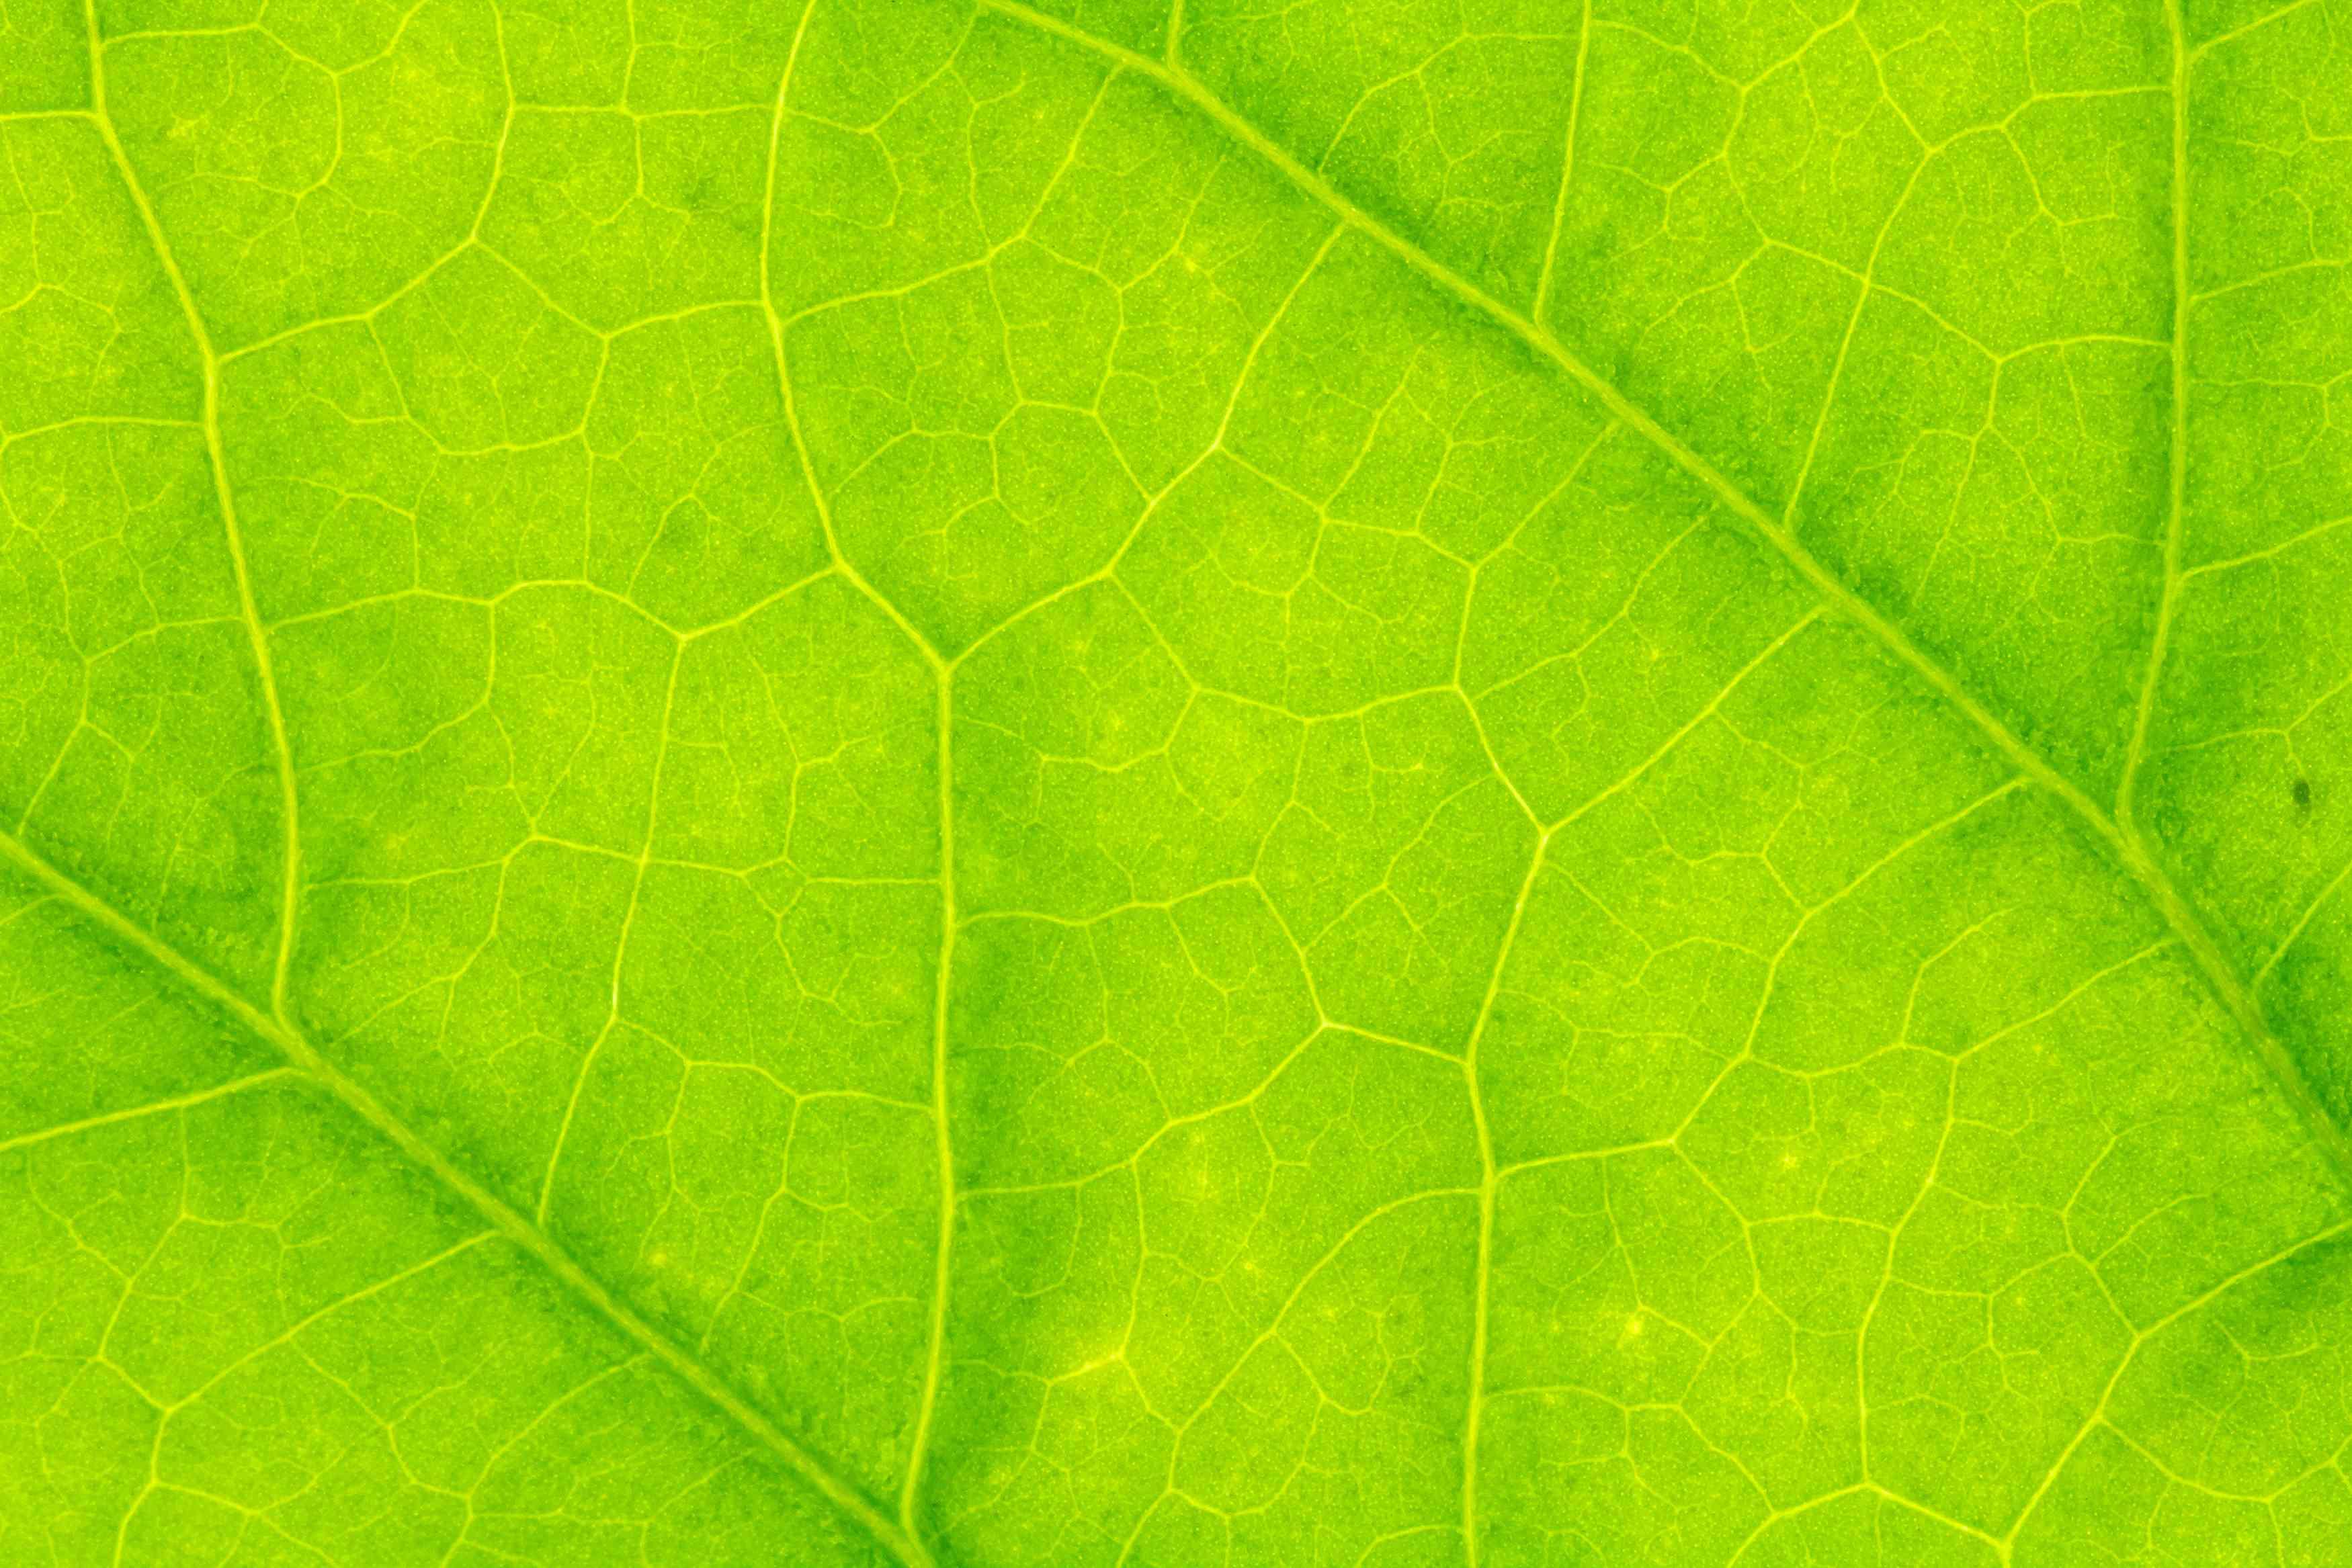 Close-up of leaf showing veins